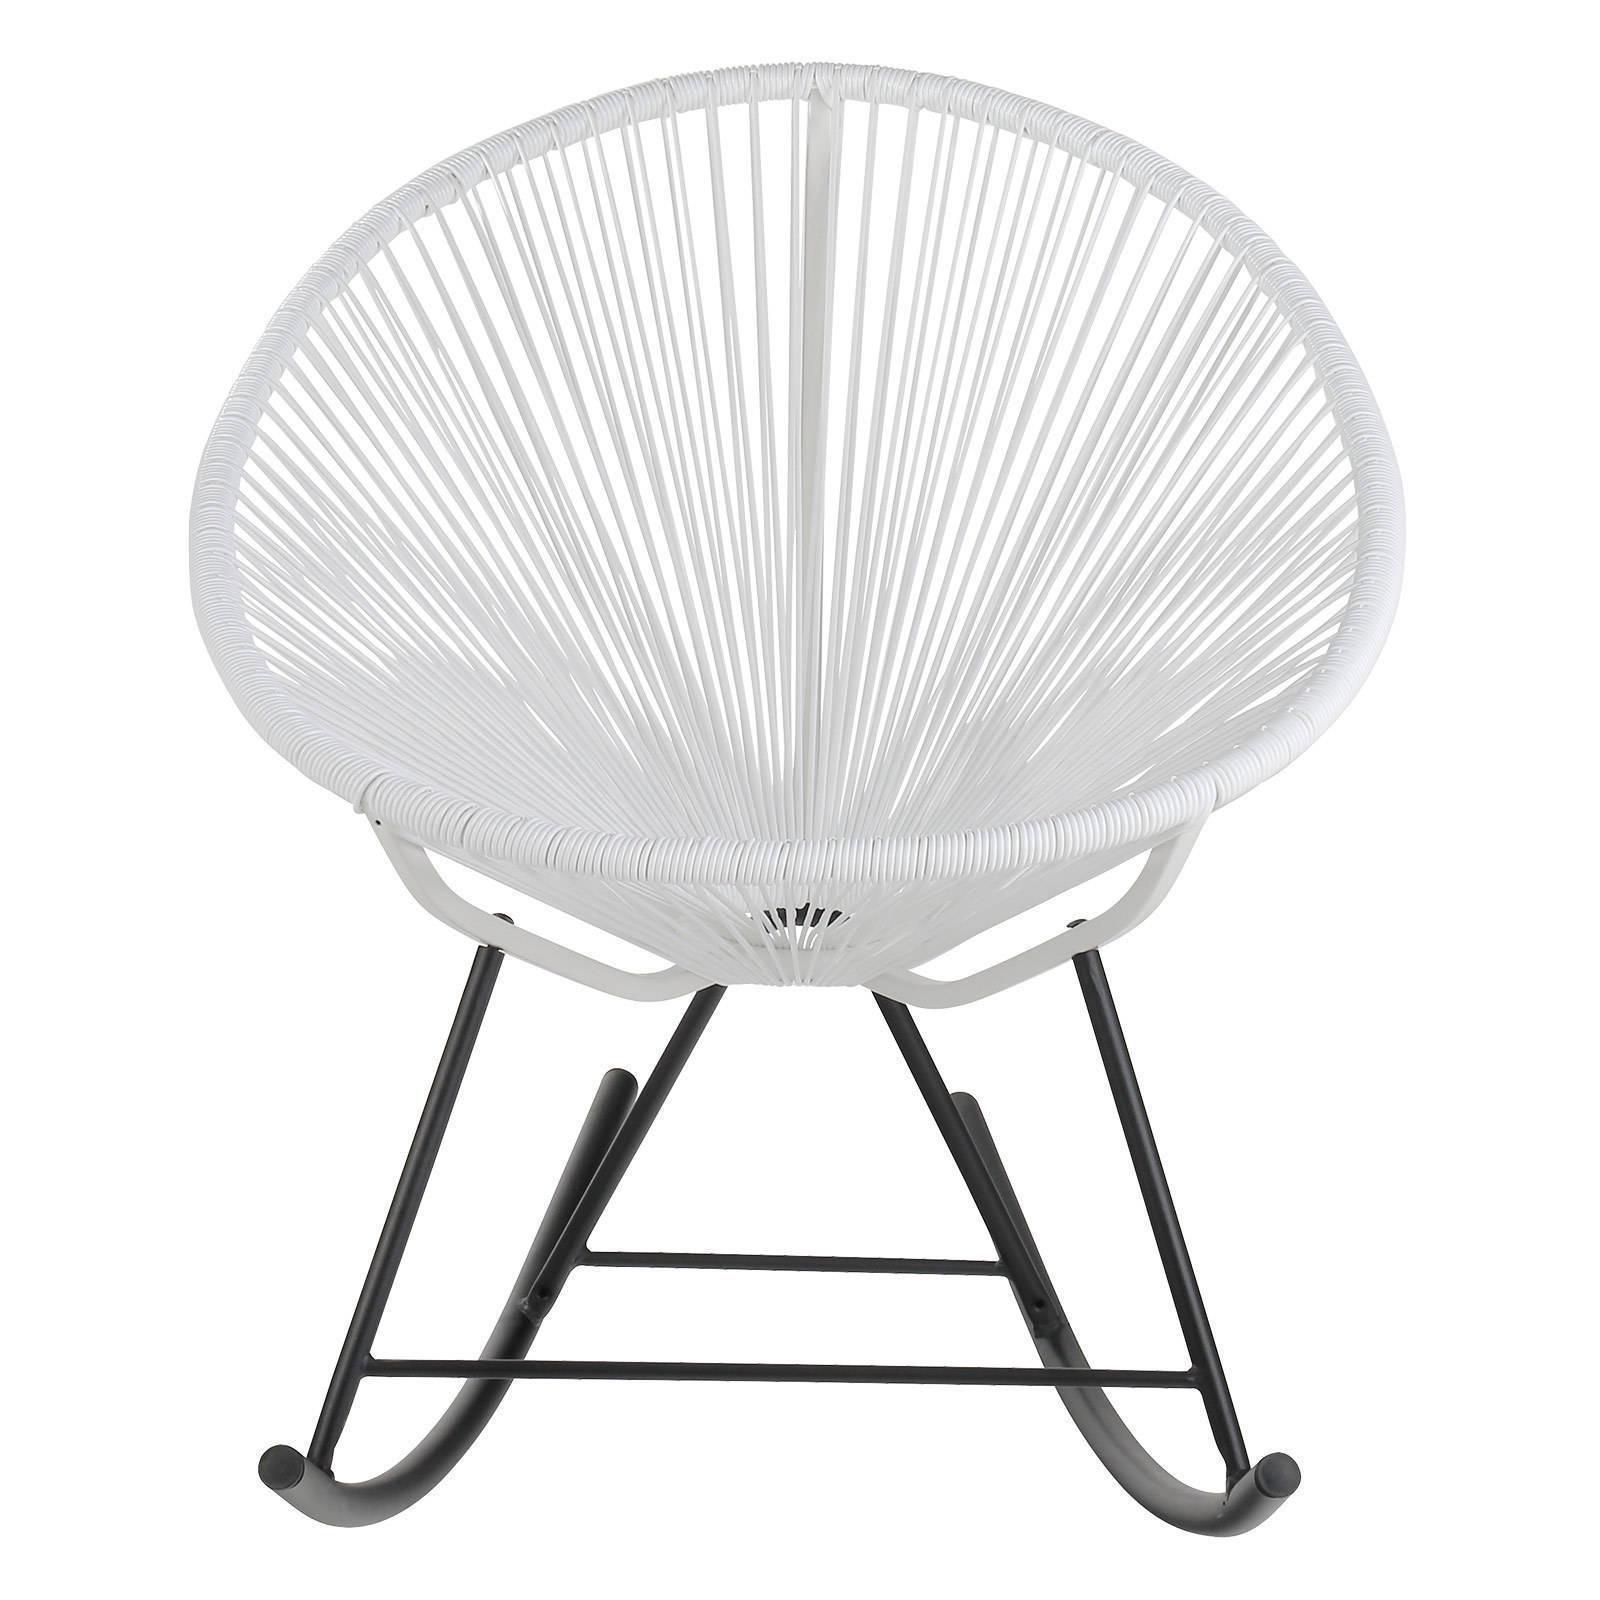 Joseph Allen Acapulco Woven Basket Rocking Chair (Acapulc...